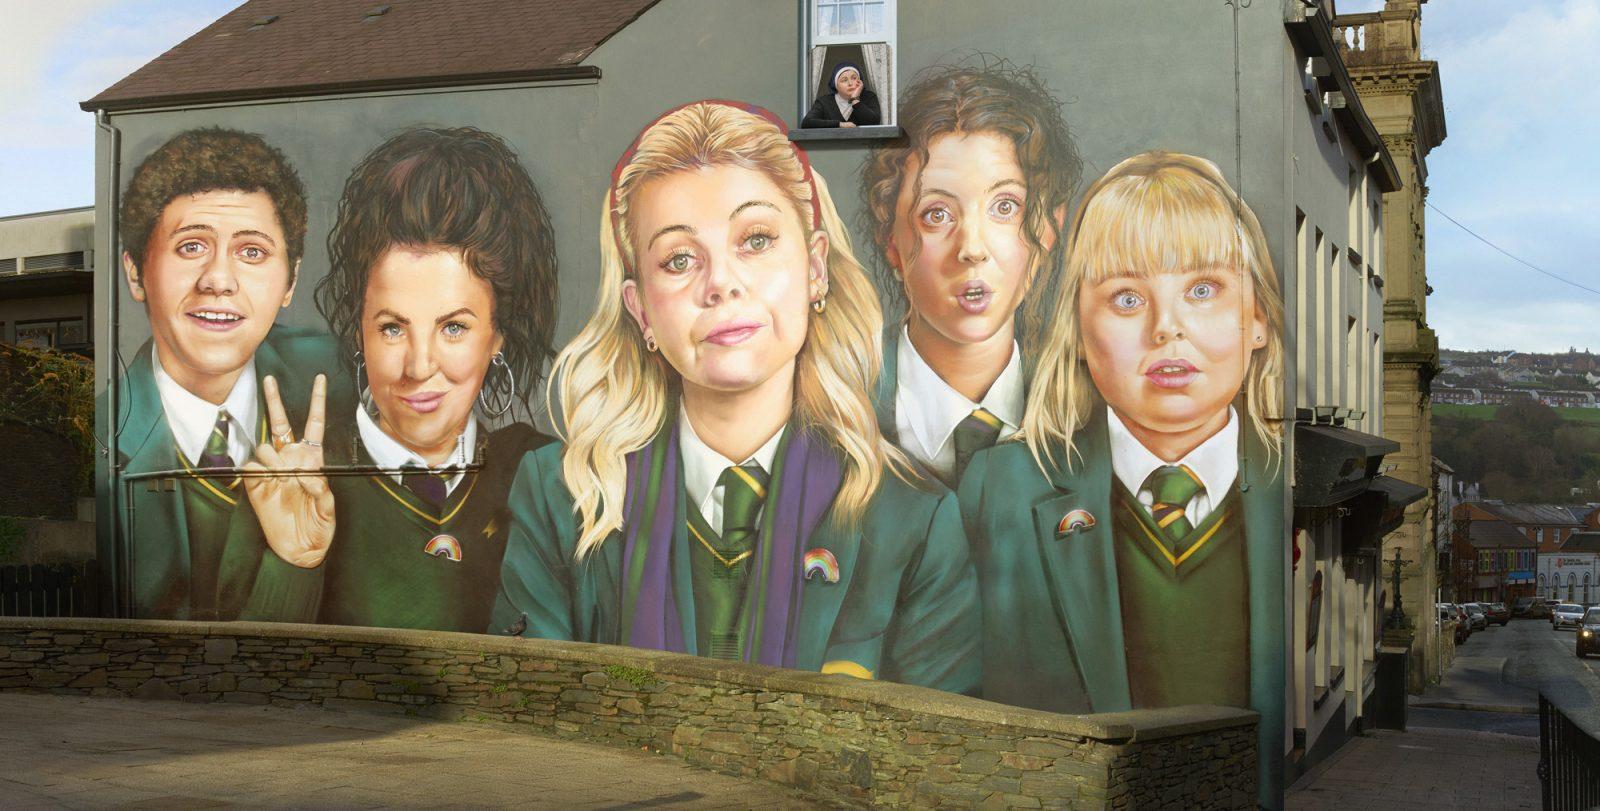 Thumbnail for Derry Girls Mural